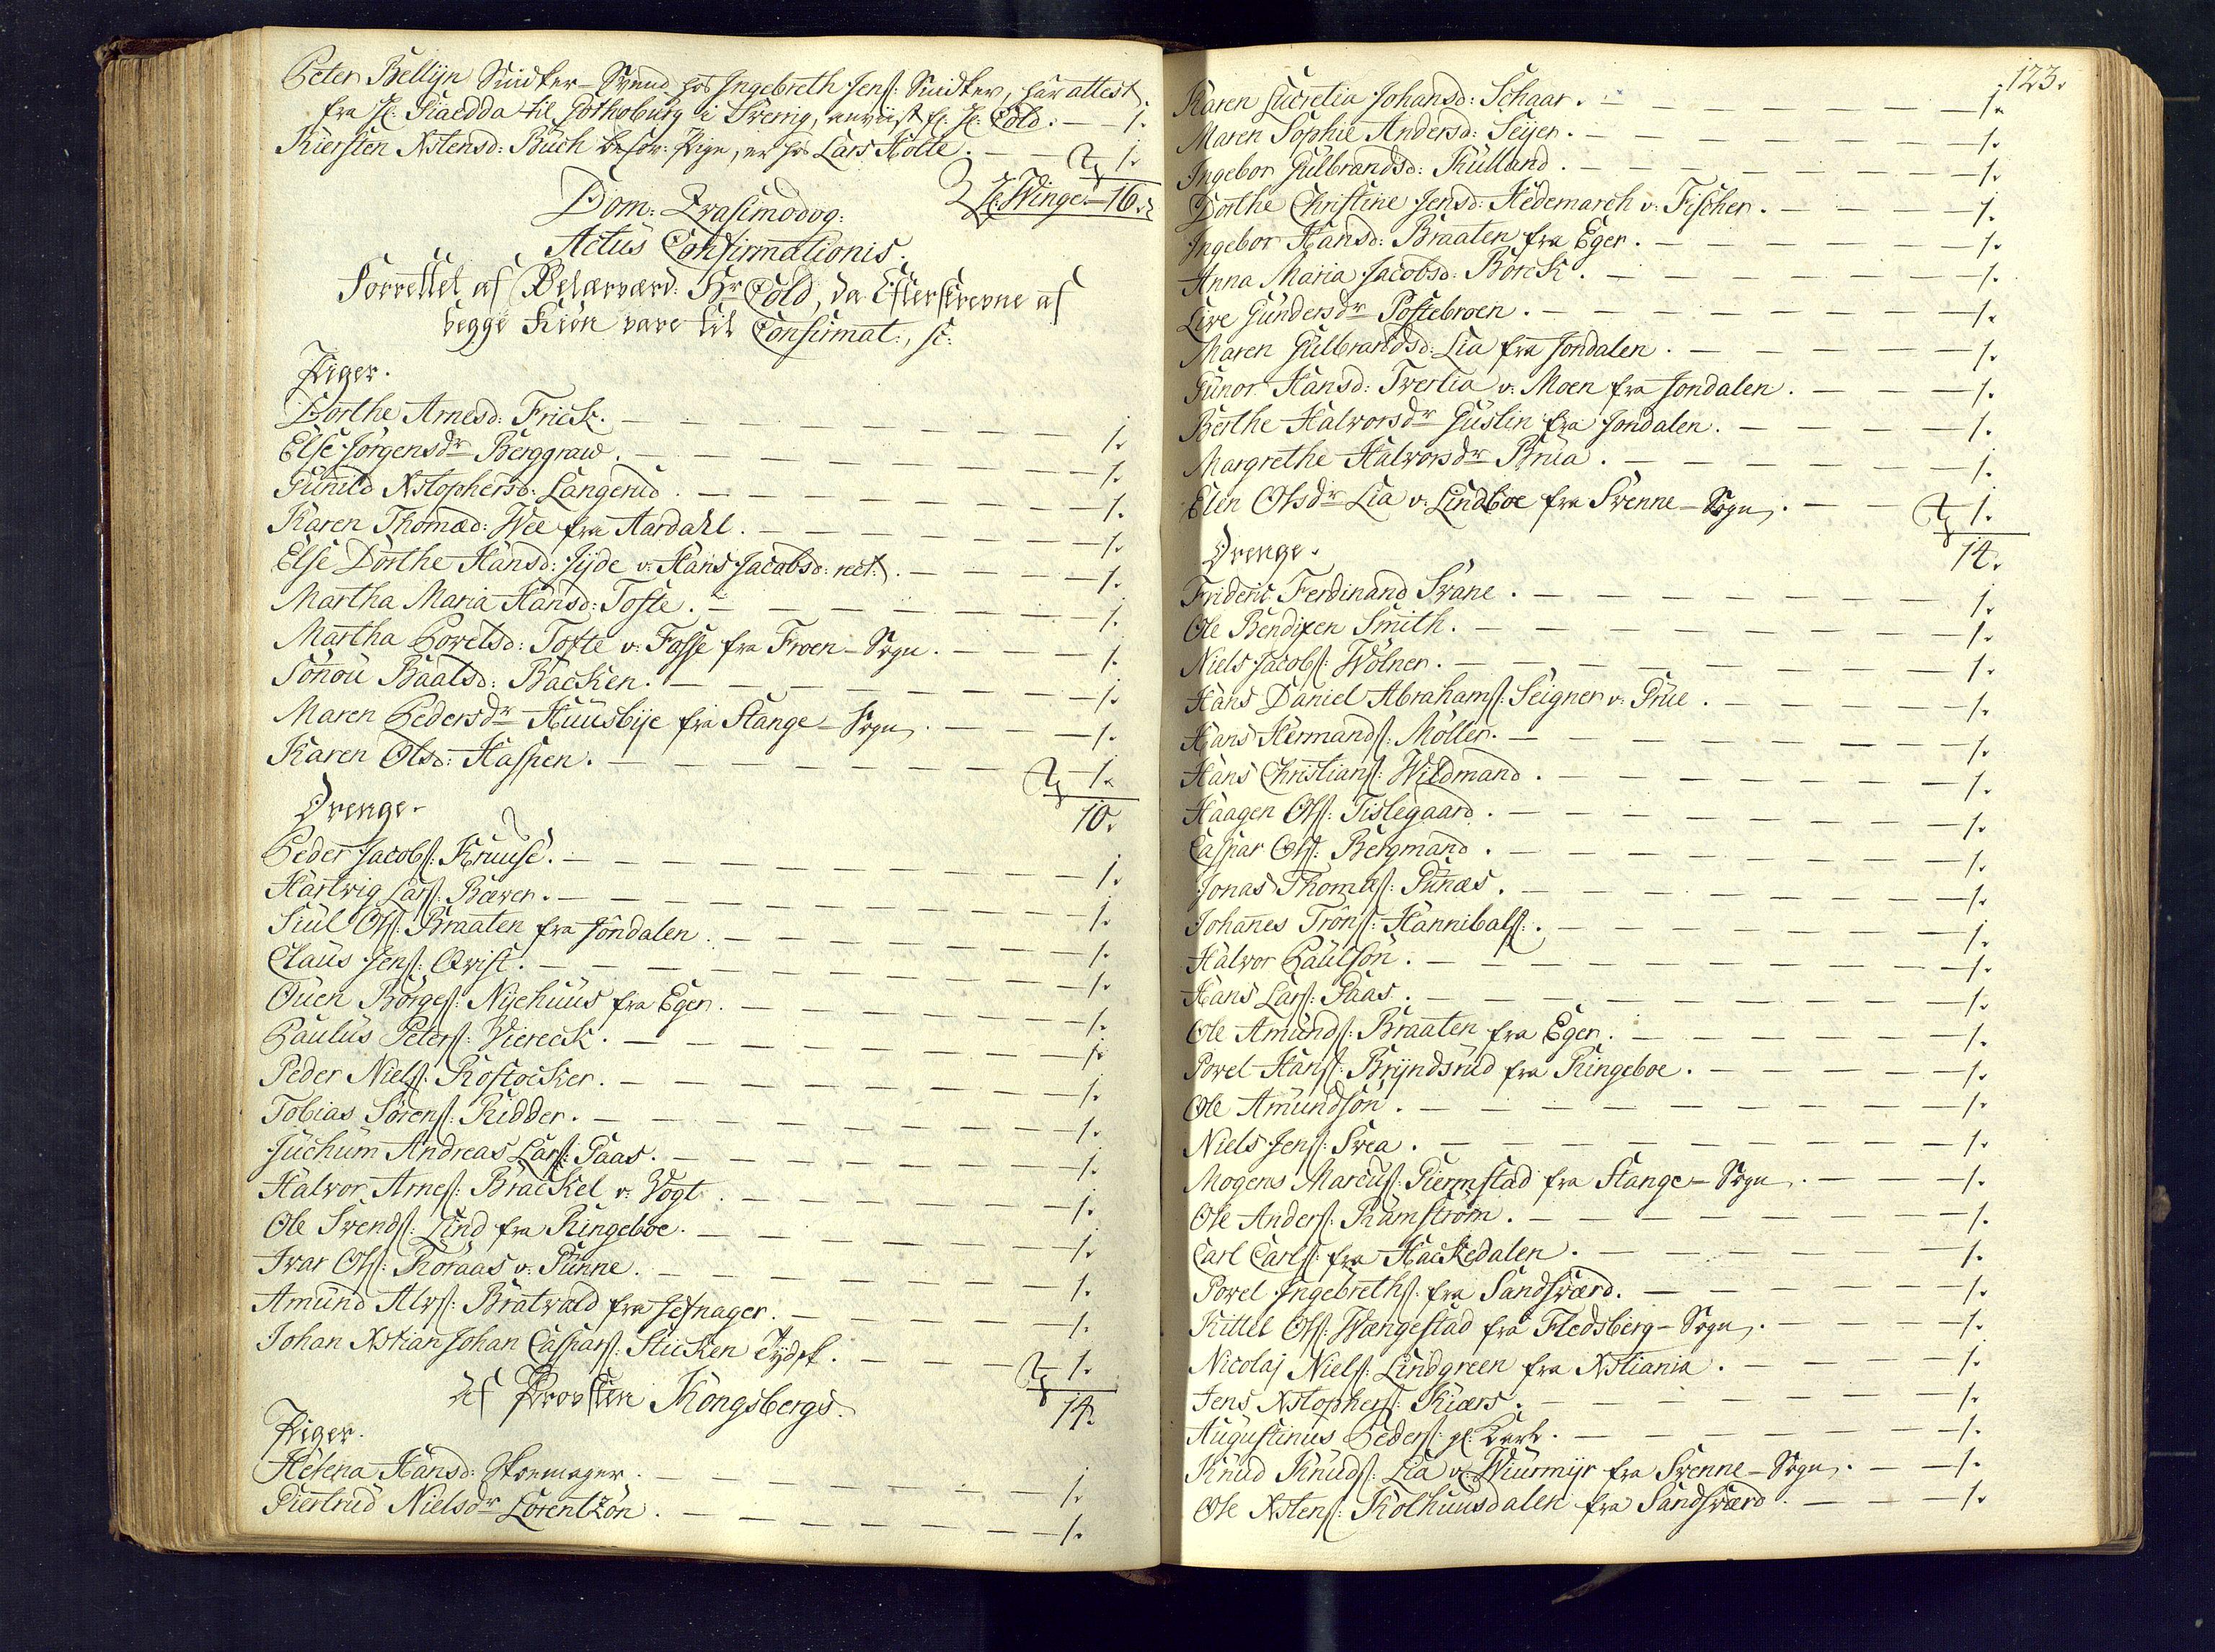 SAKO, Kongsberg kirkebøker, M/Ma/L0005: Kommunikantprotokoll nr. 5, 1755-1761, s. 123